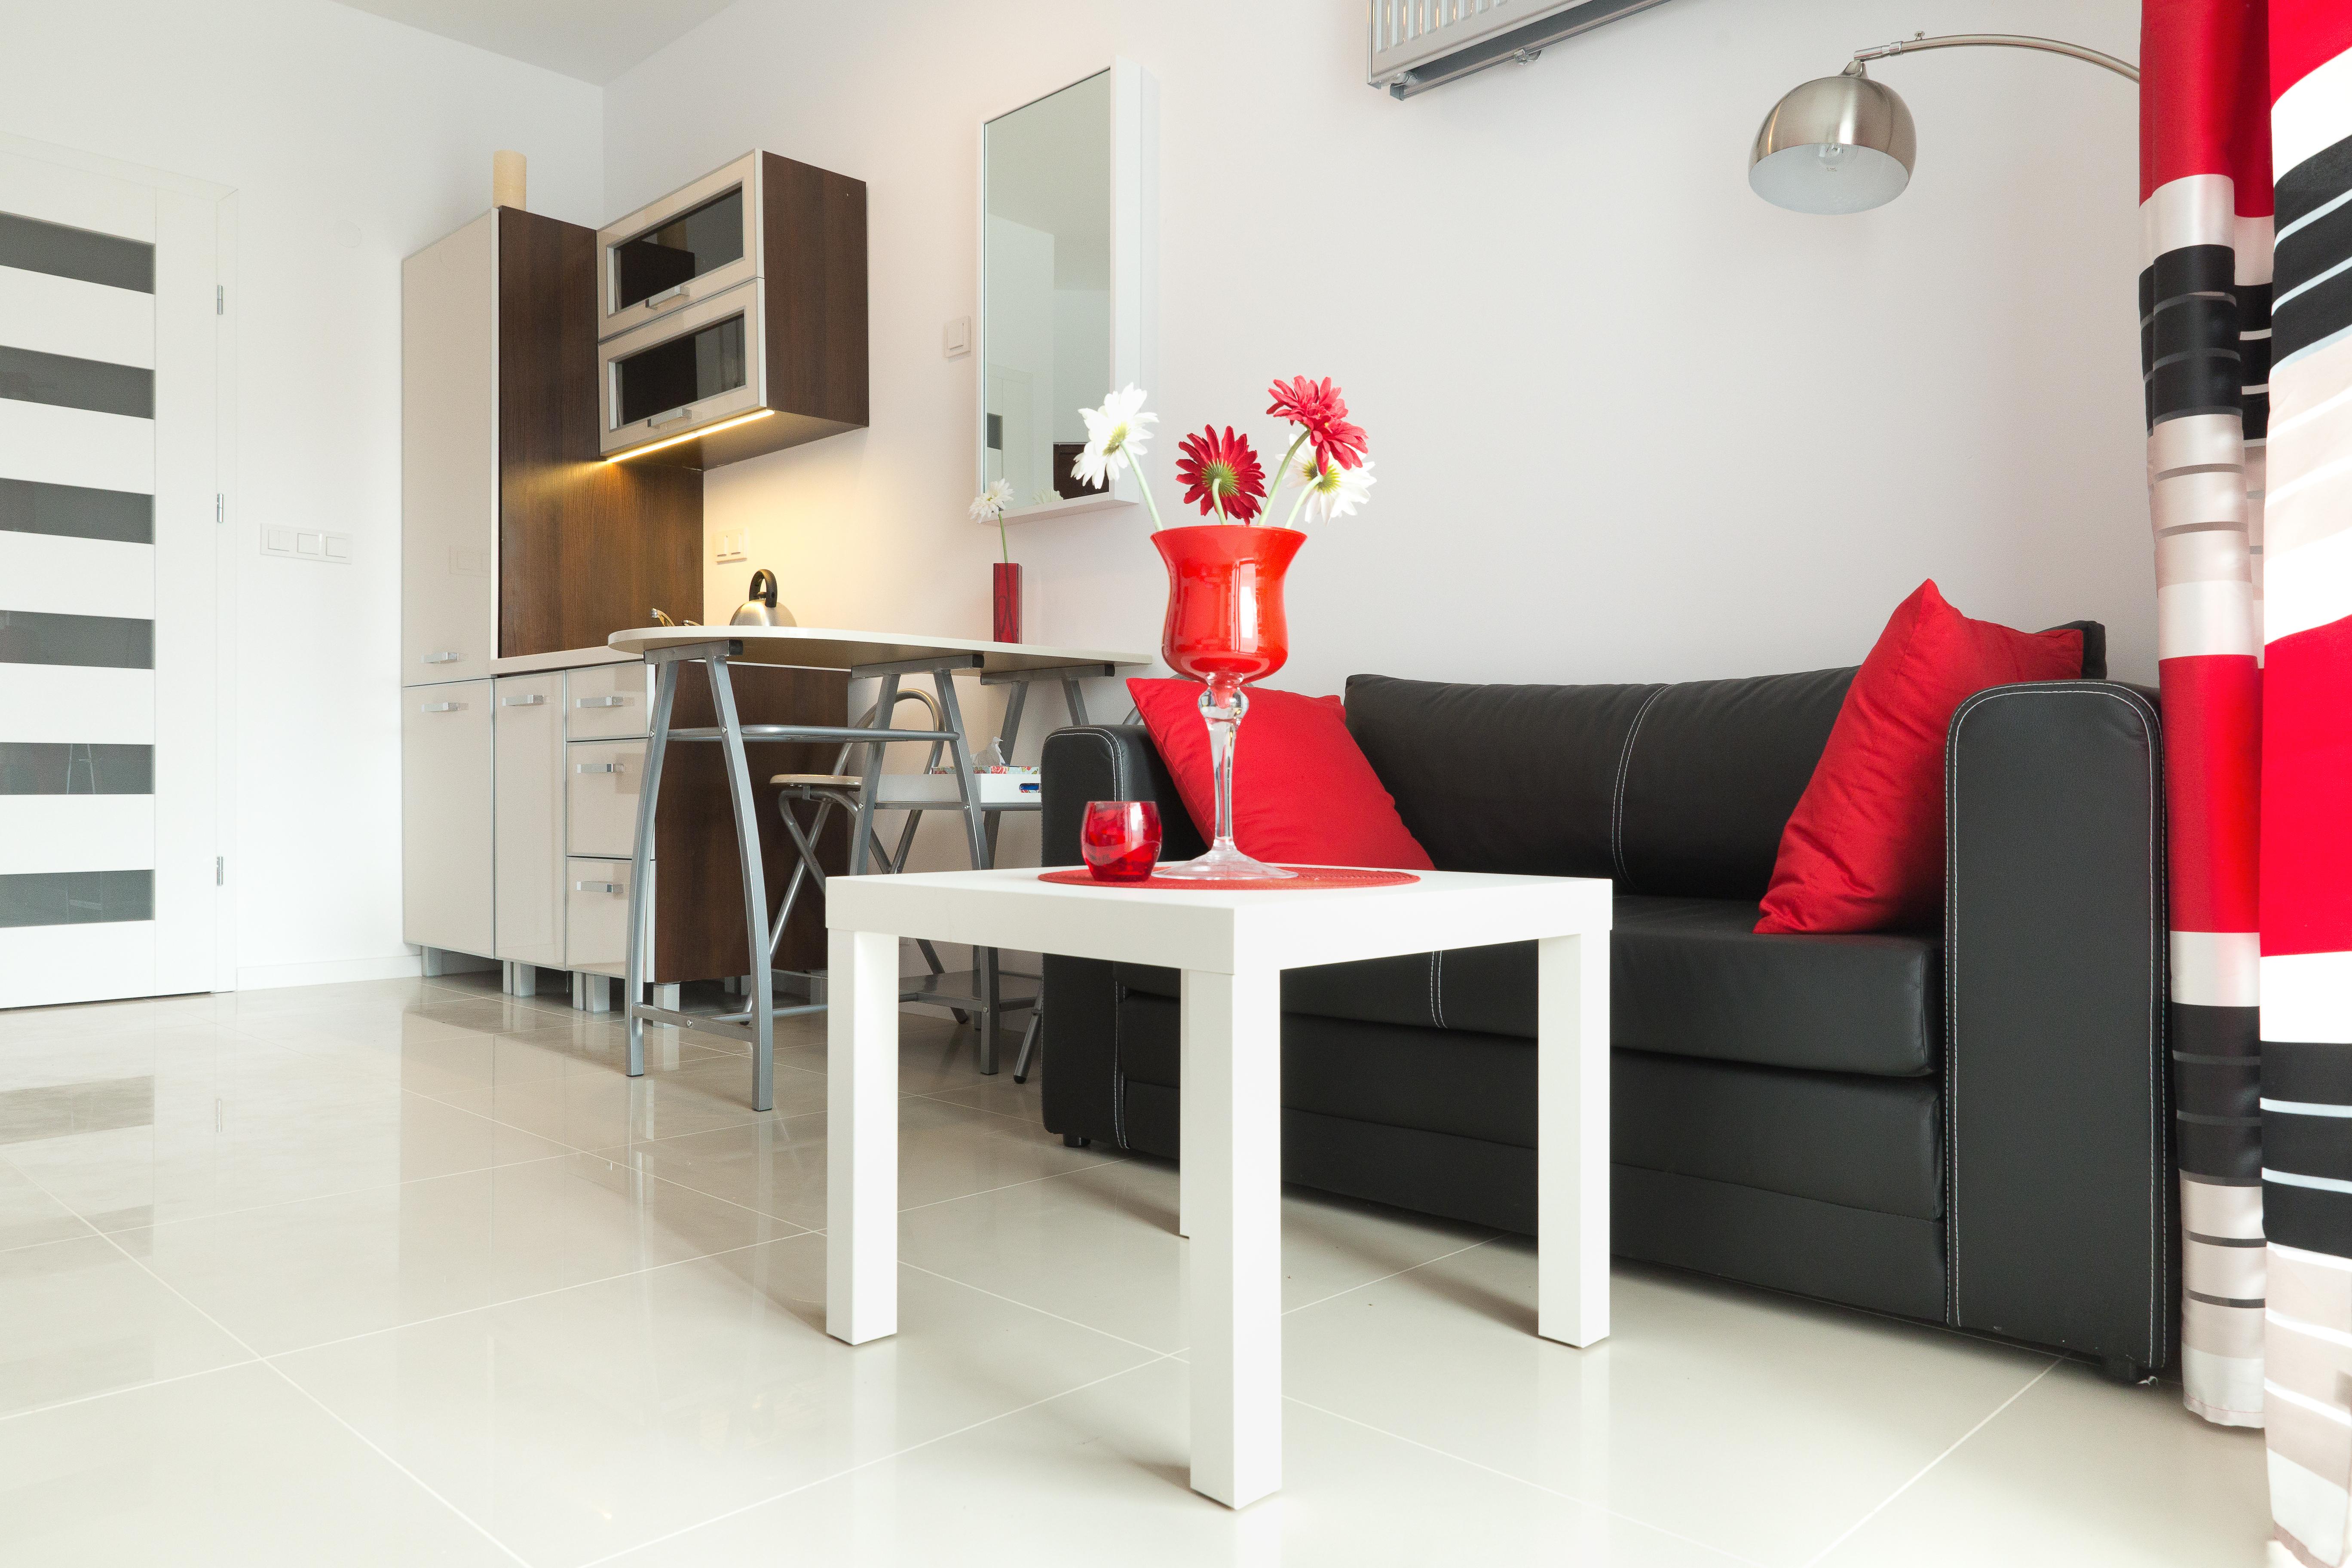 Апартаменты red дом в дубае цена